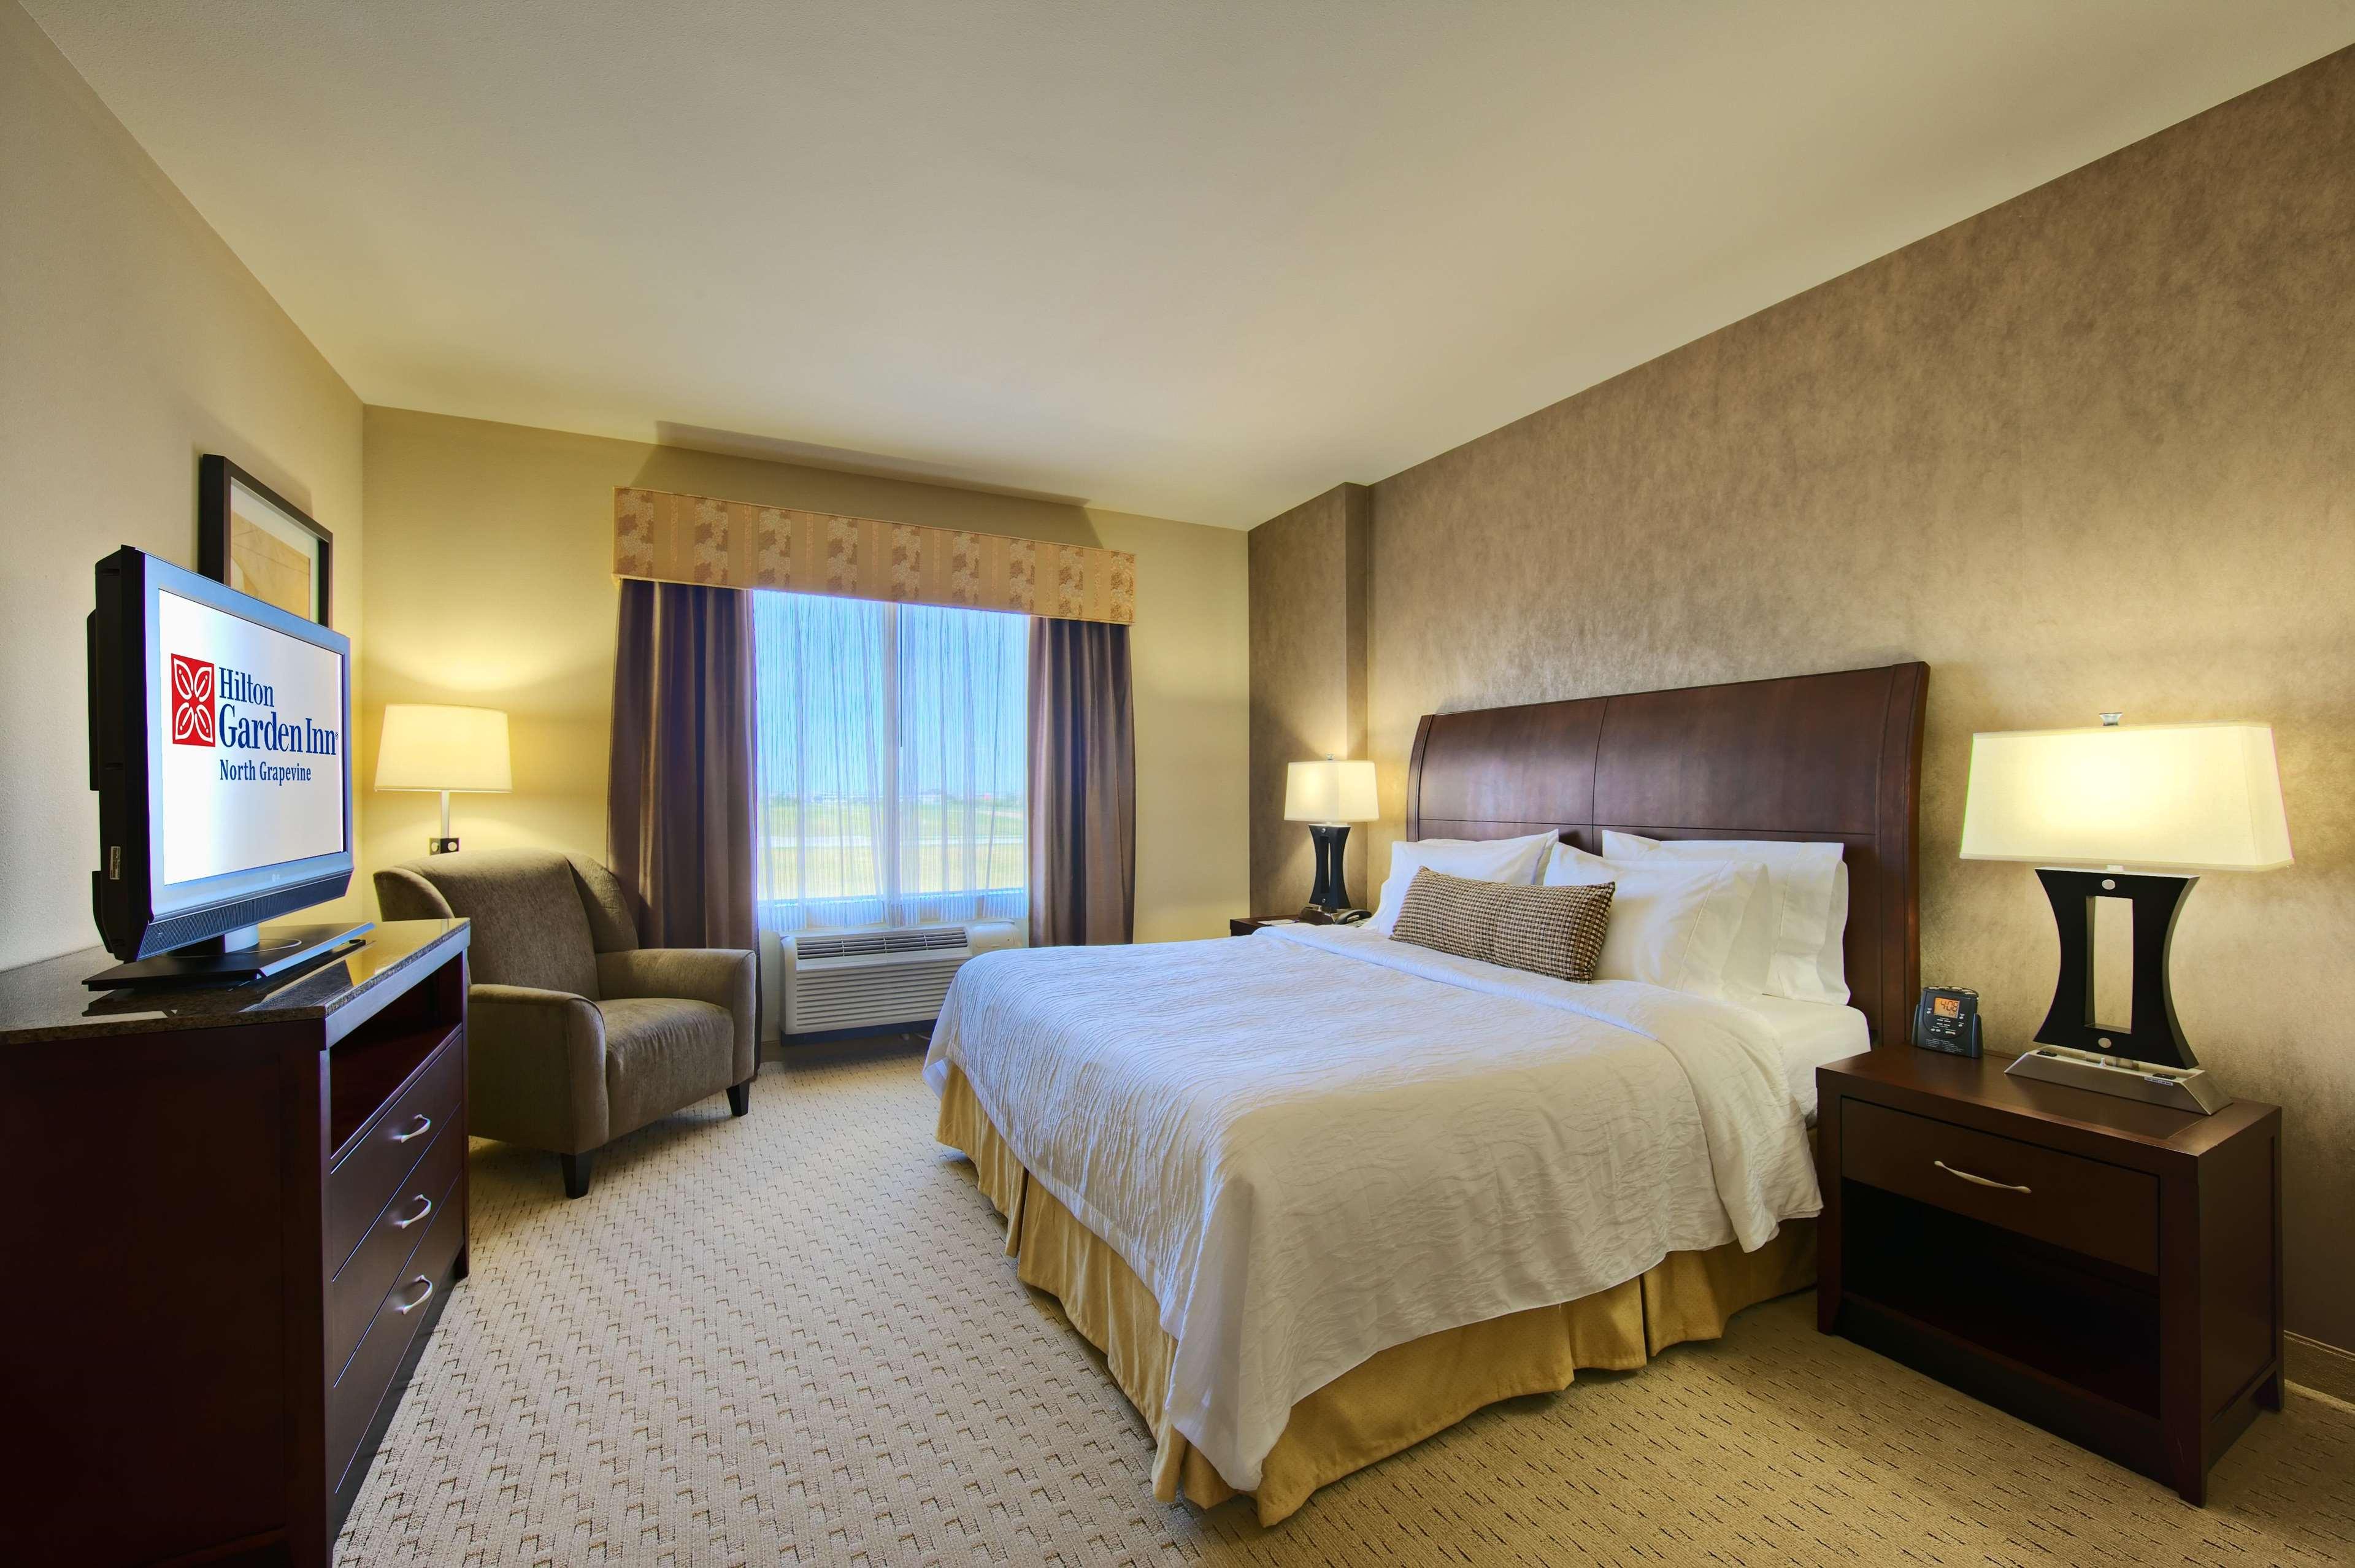 Hilton Garden Inn DFW North Grapevine image 21